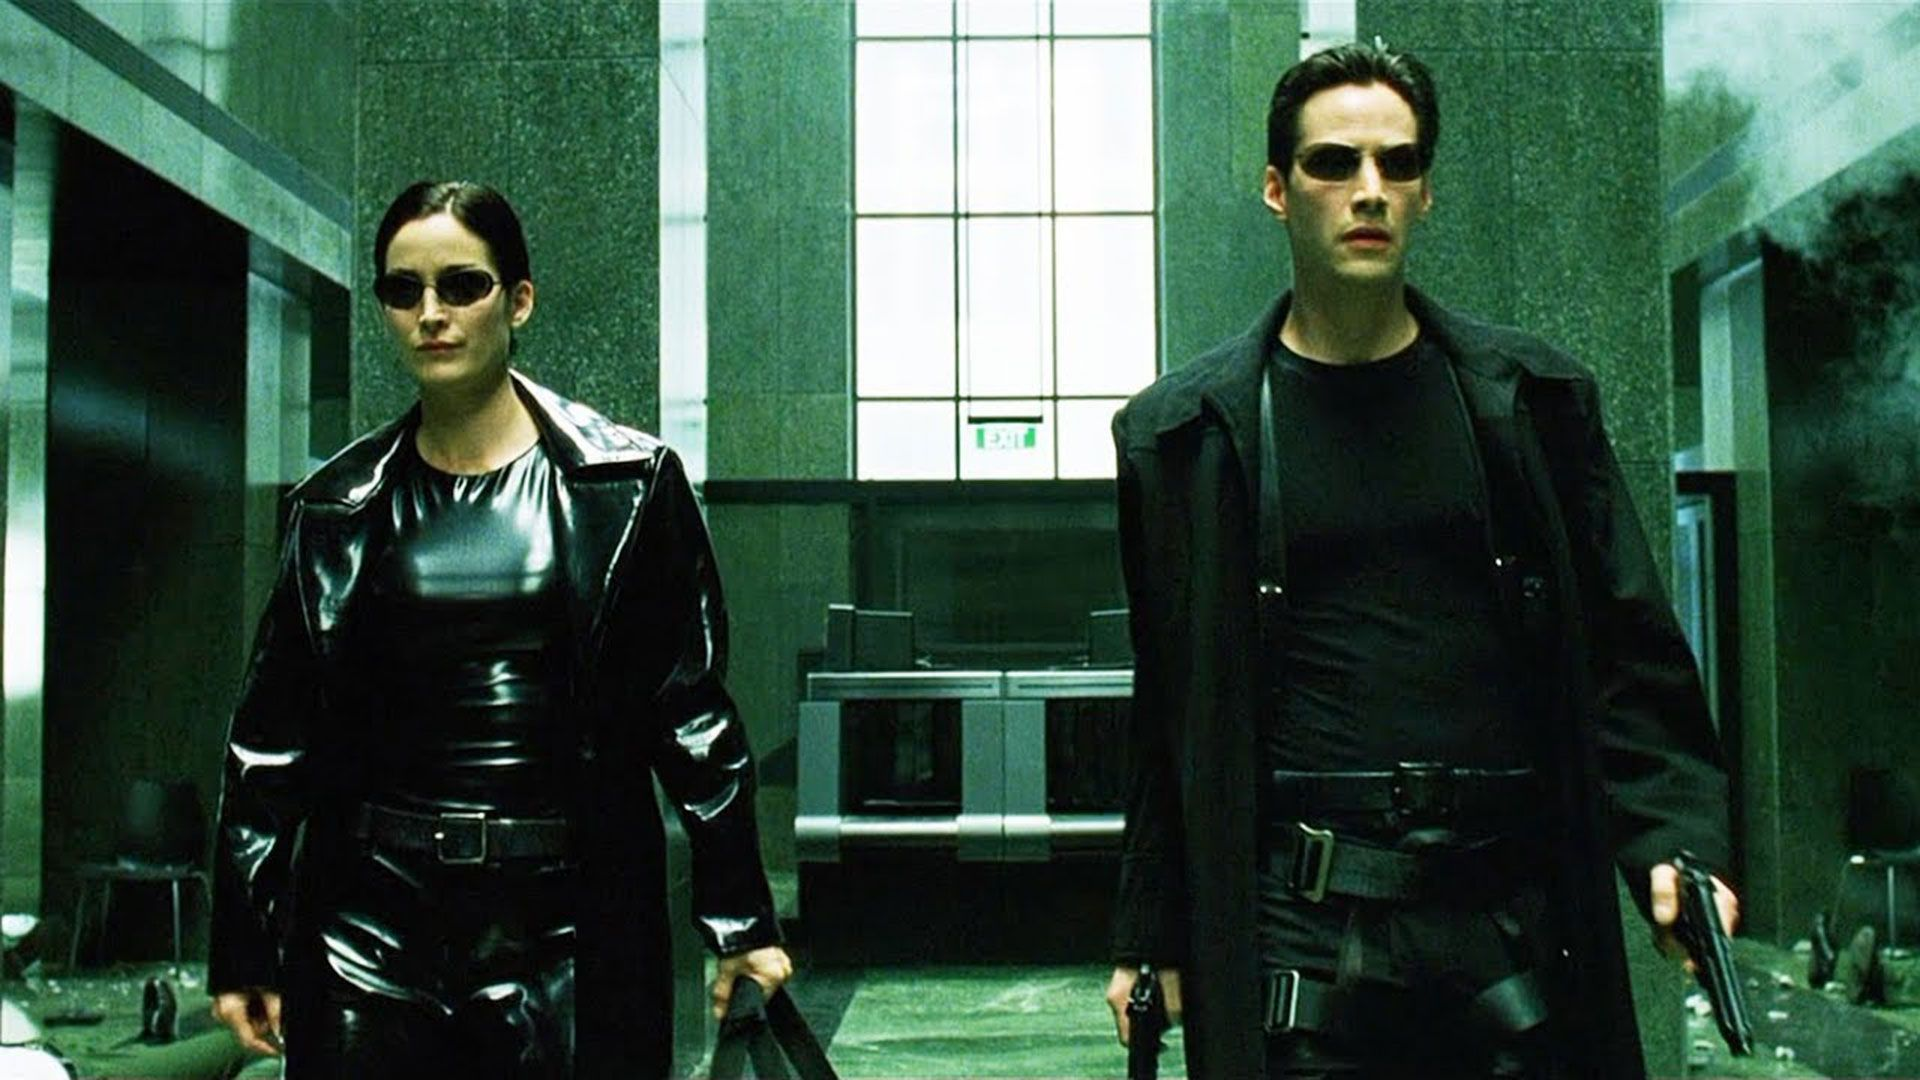 Matrix 4 Trama Sinopsis Teorías Argumento